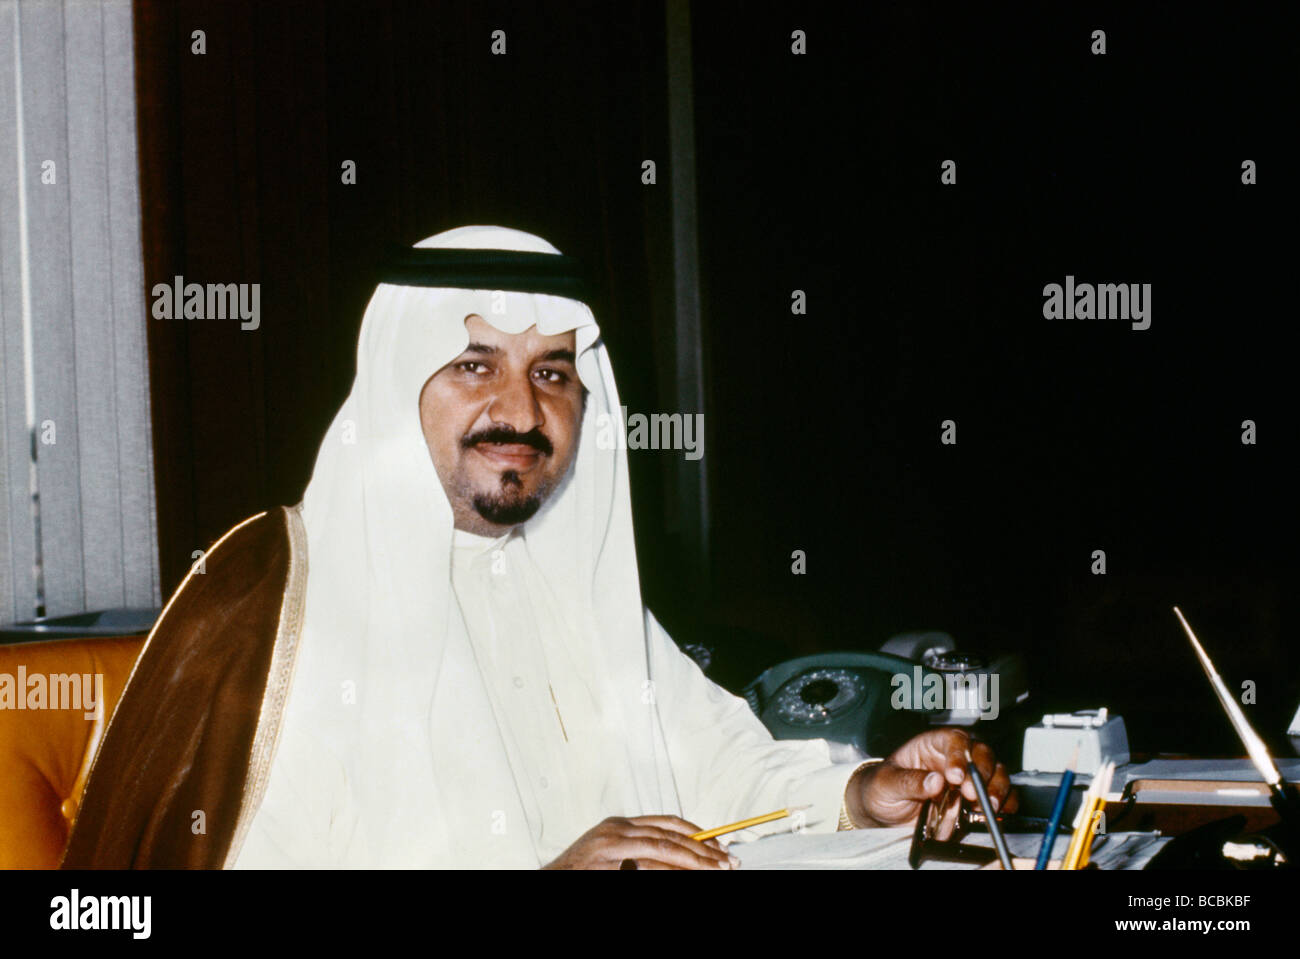 Saudi Arabia Prince Sultan Bin Abdul Aziz - Stock Image